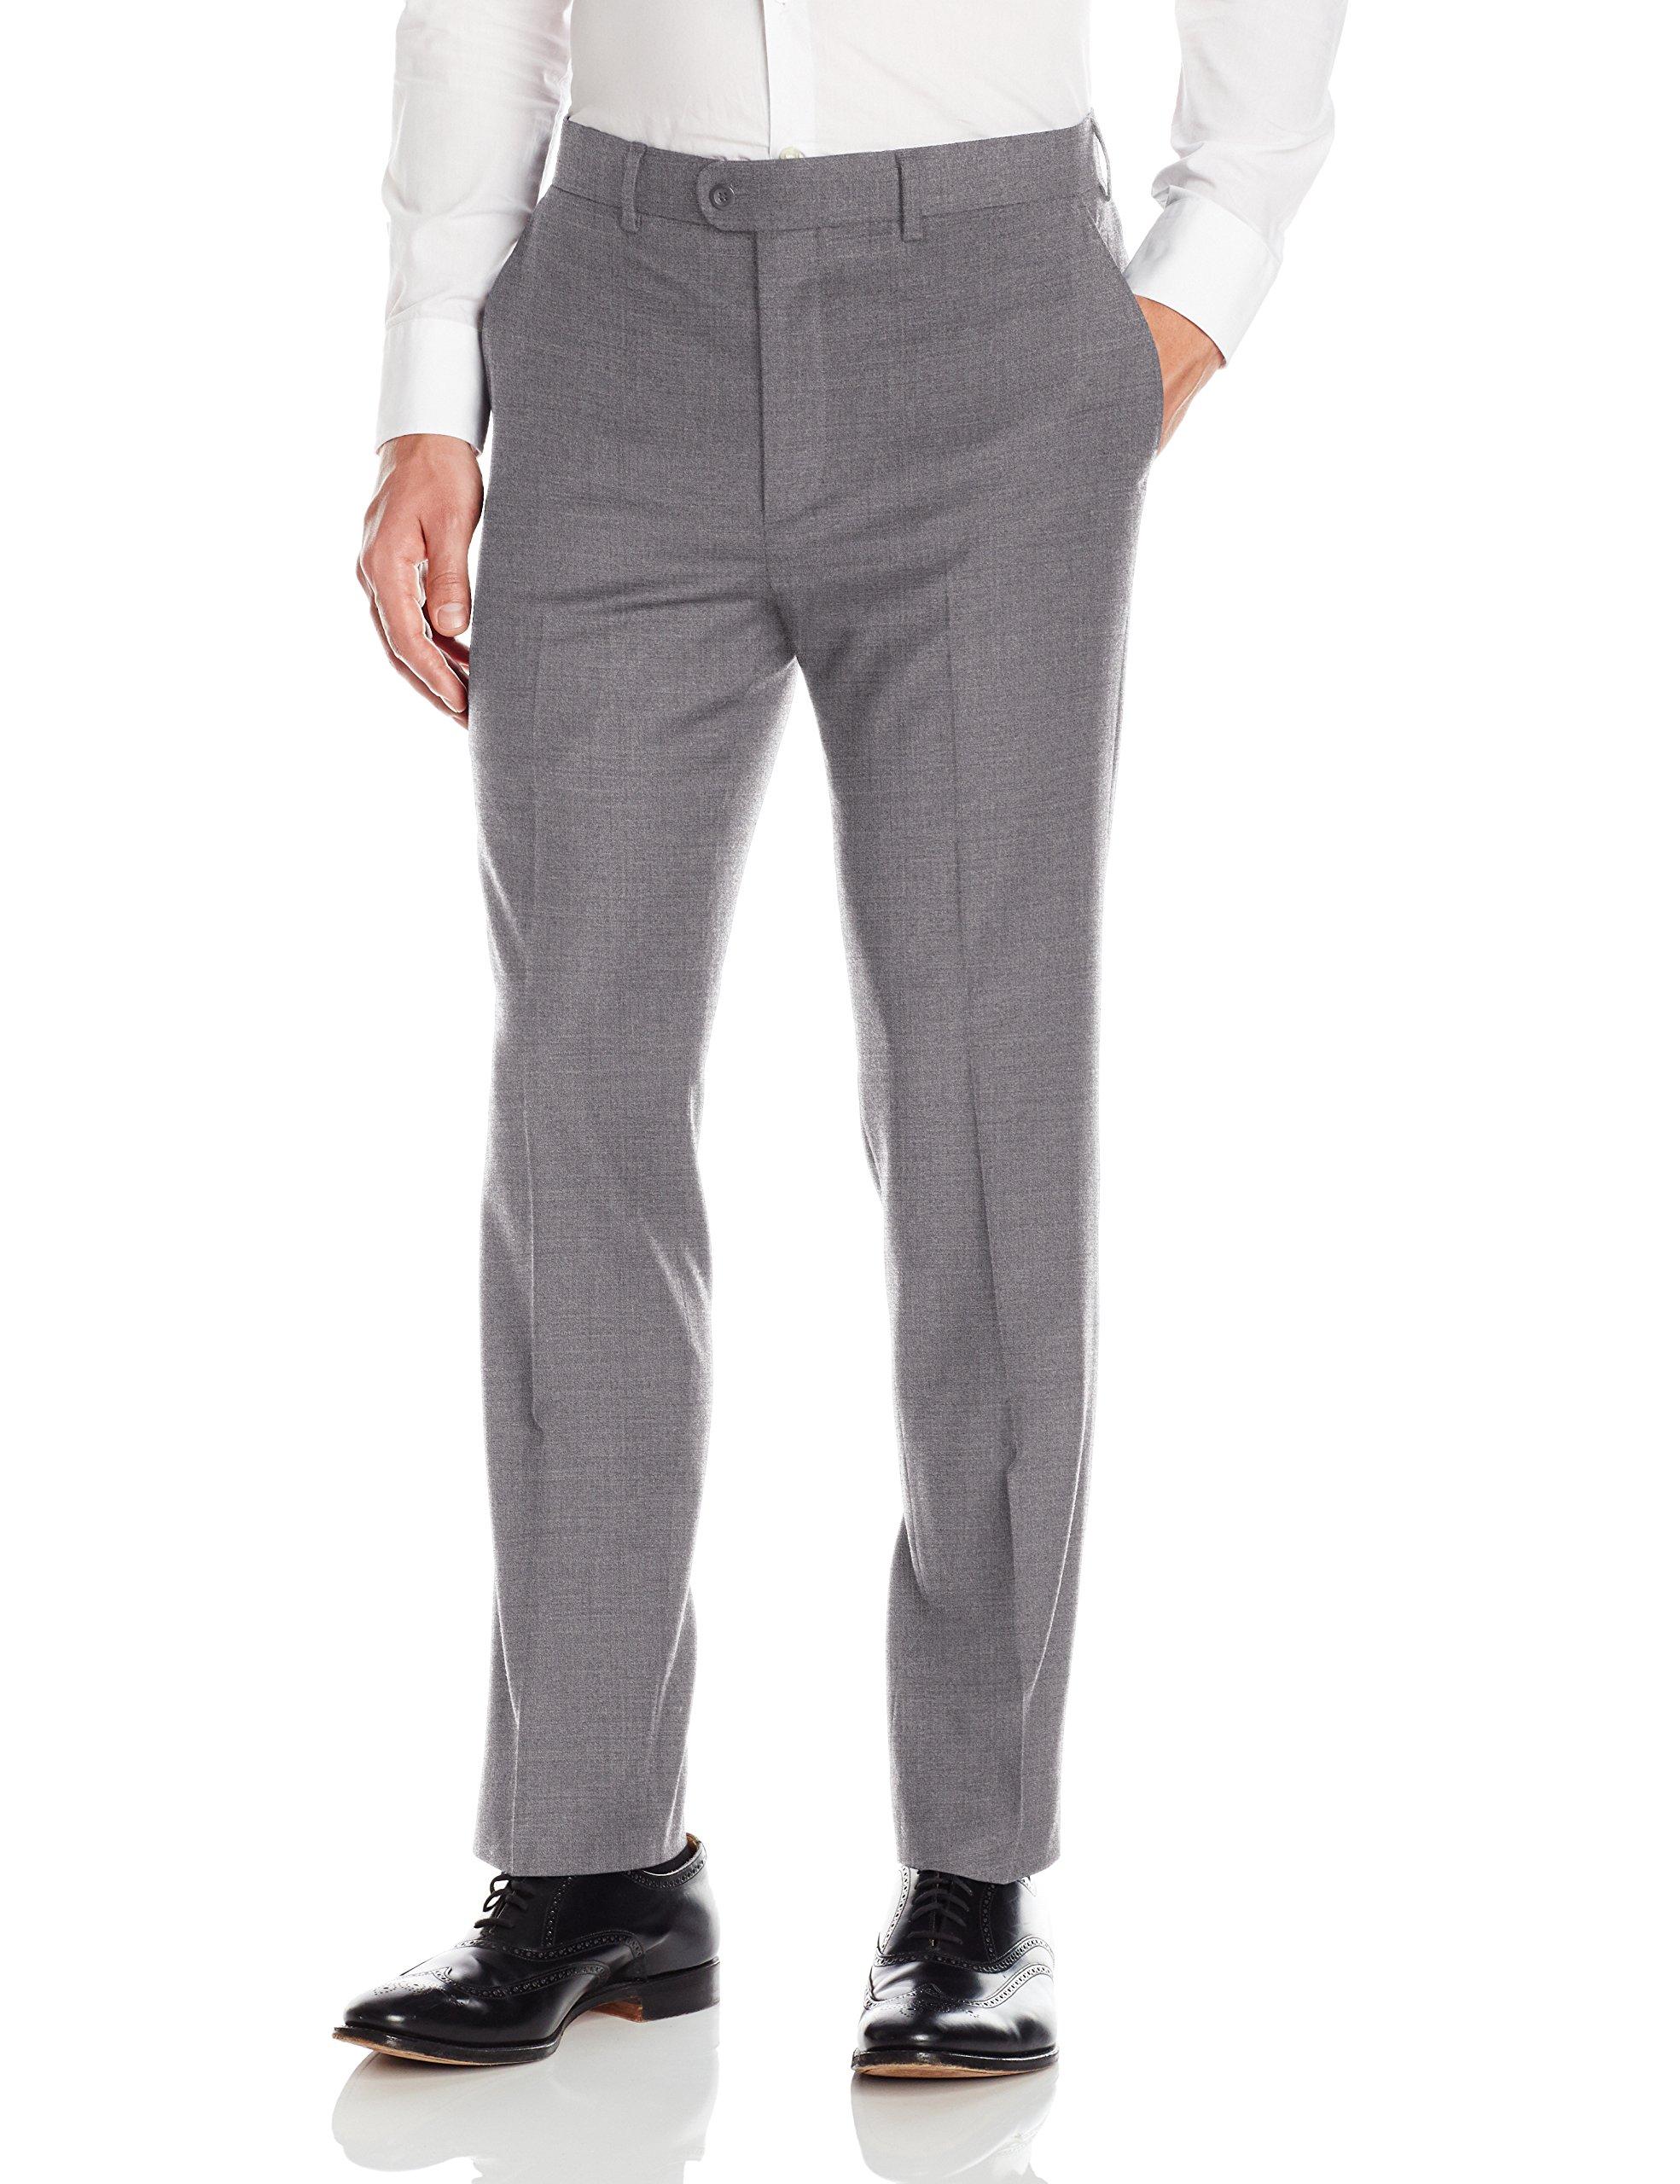 Bensol Men's Flat Front Slim Fit Wool Gabardine Pant, Medium Grey, 34W X 32L by Bensol